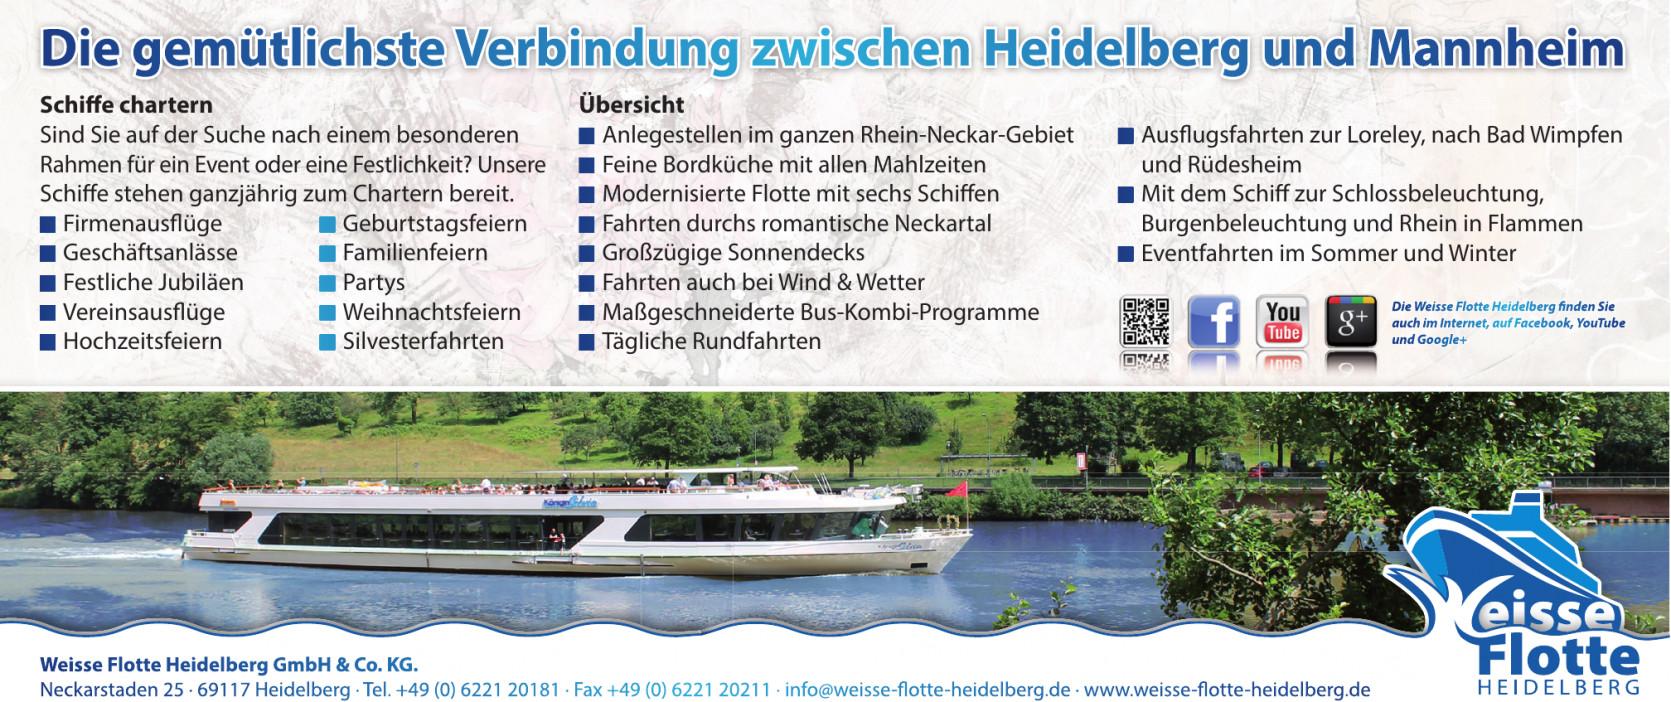 Weisse Flotte Heidelberg GmbH & Co. KG.